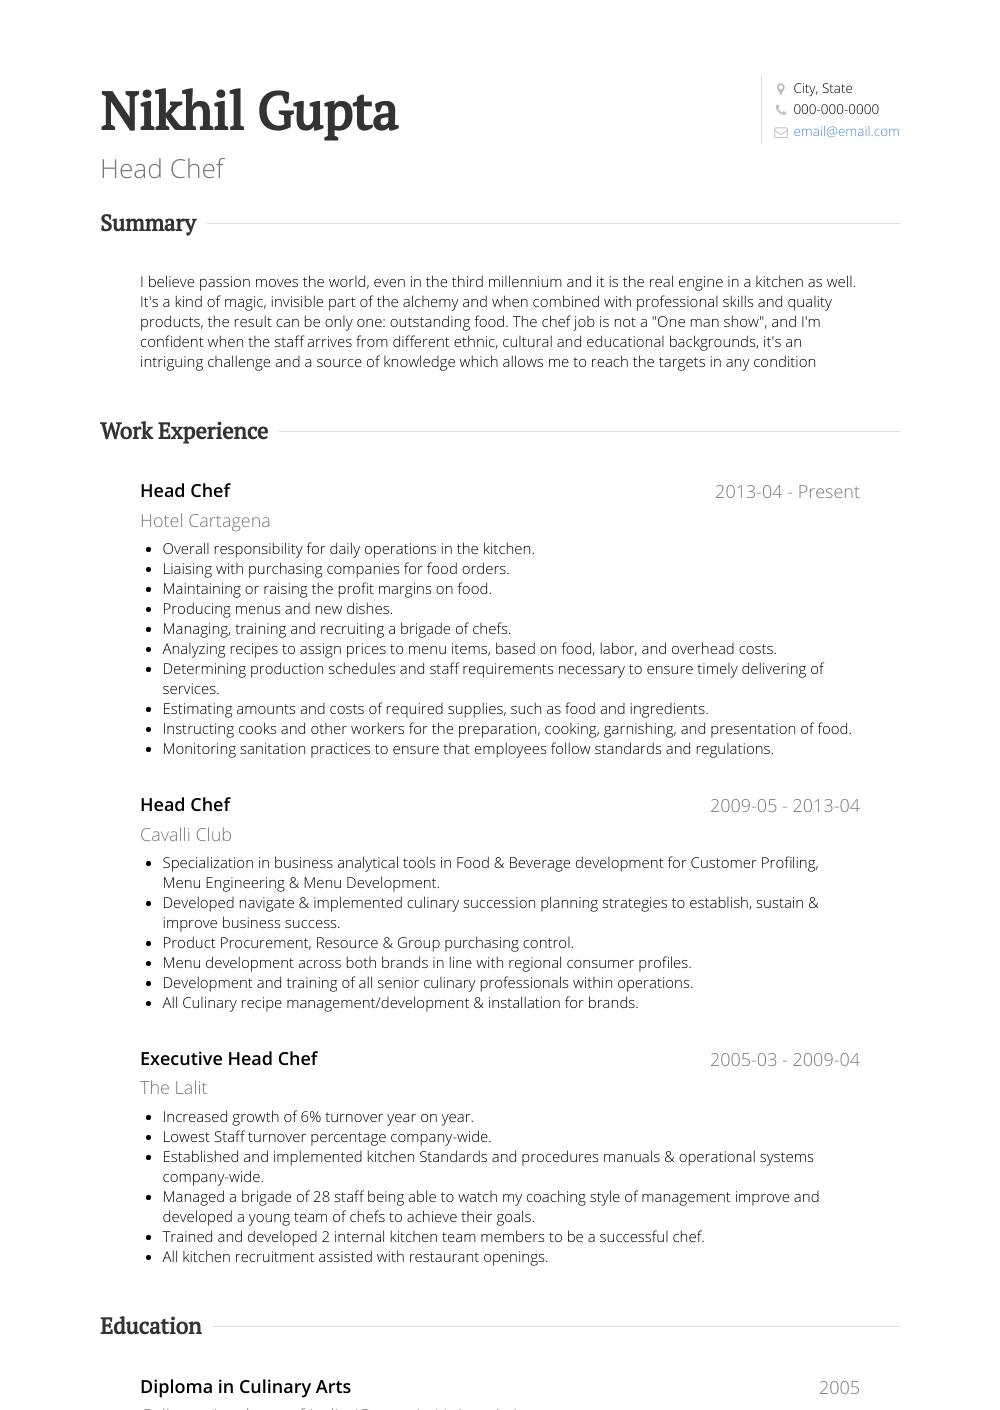 Chef Resume Samples & Templates VisualCV